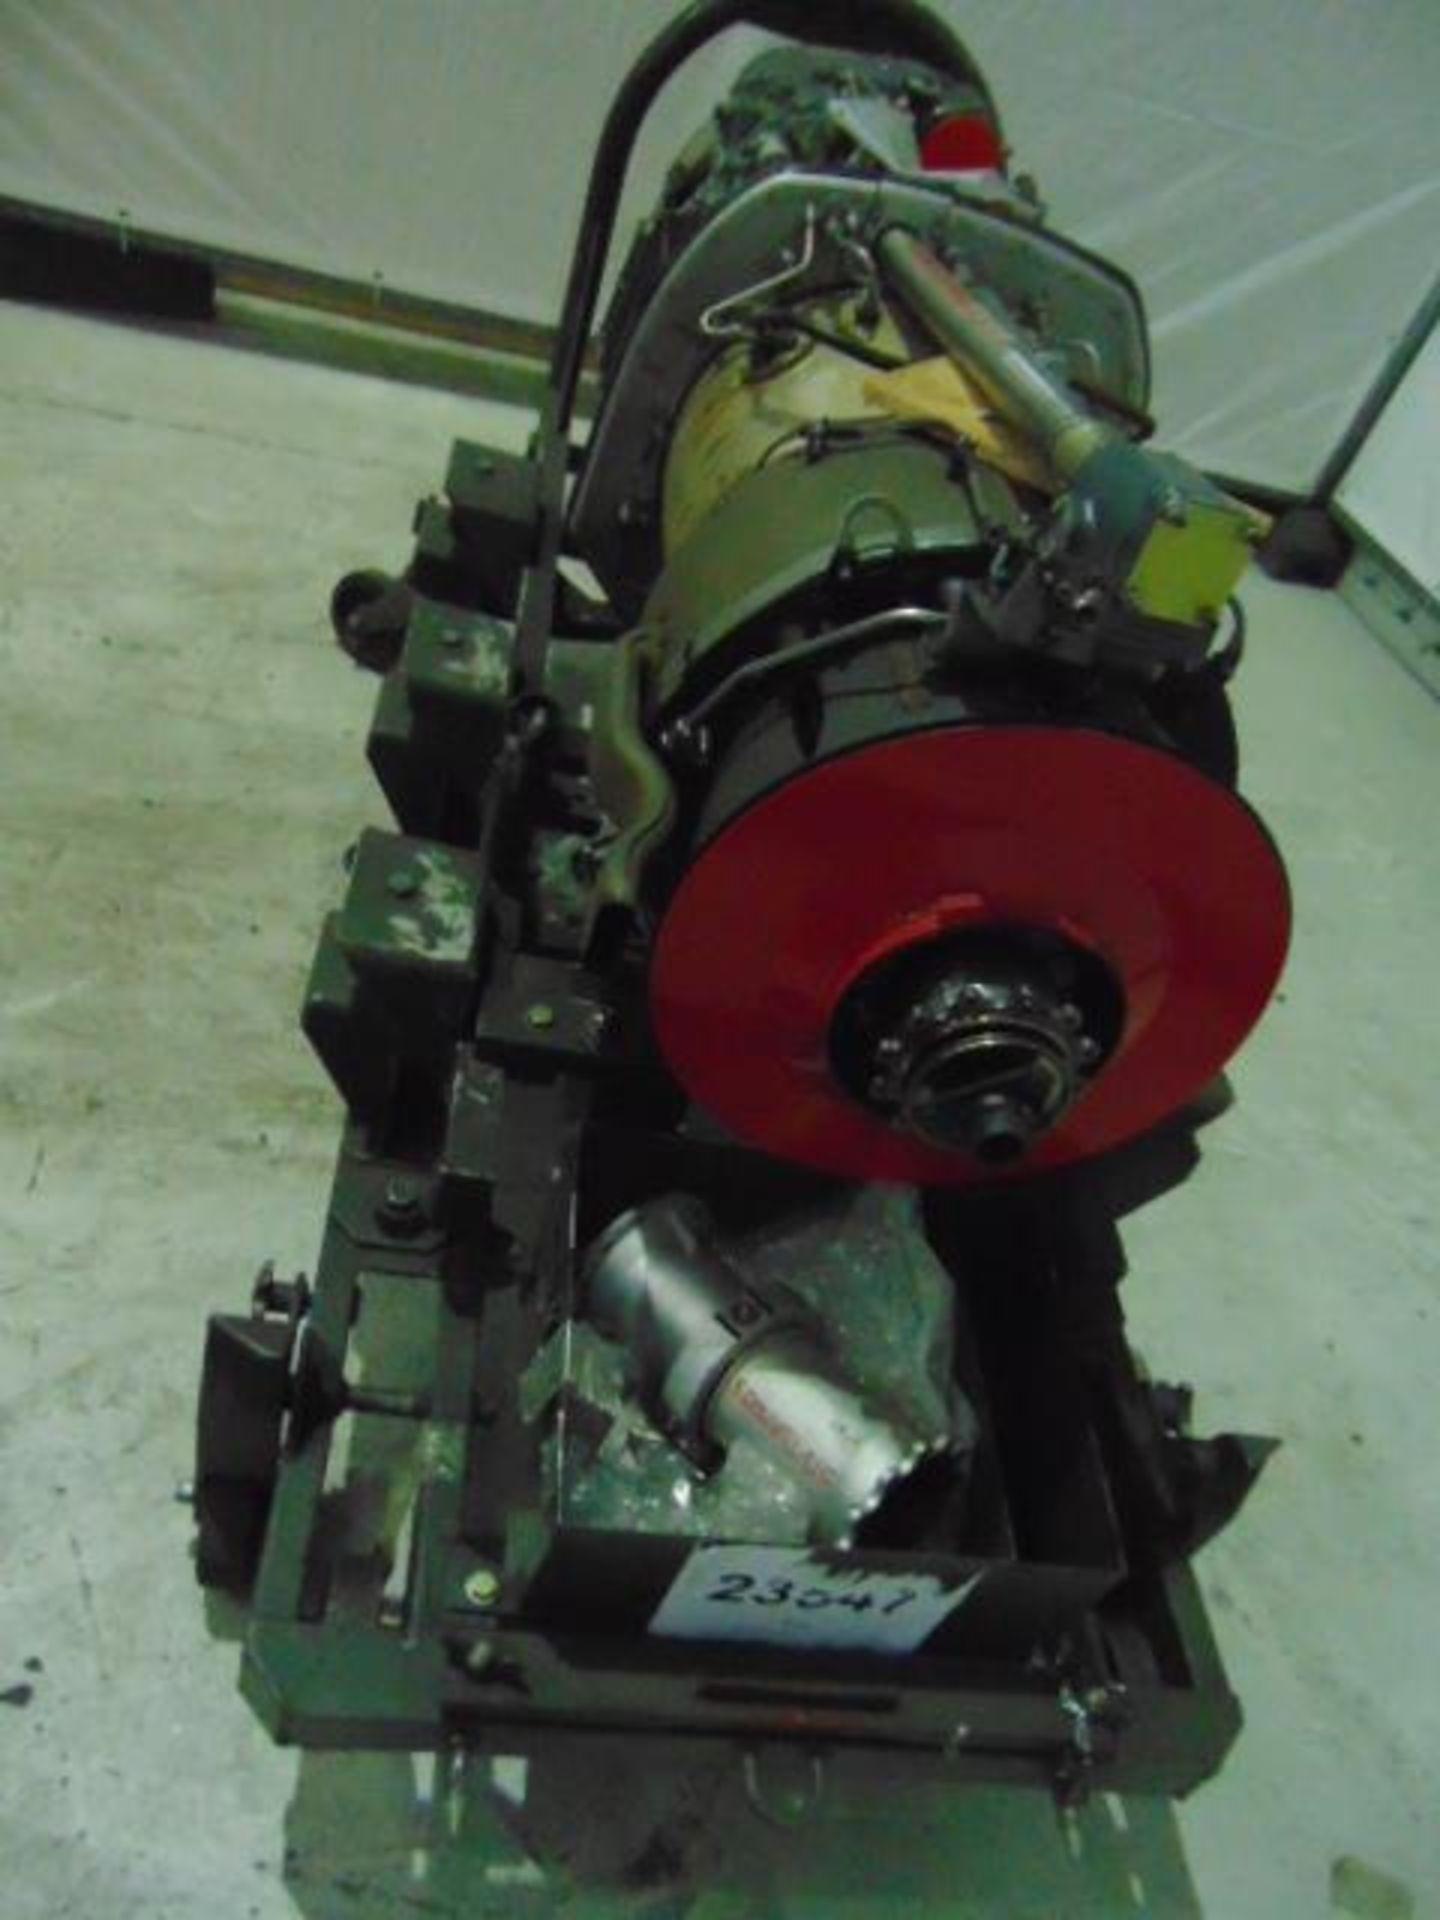 Lot 27339 - Rolls Royce / Turbomeca Turbine 3C4 Jet Engine